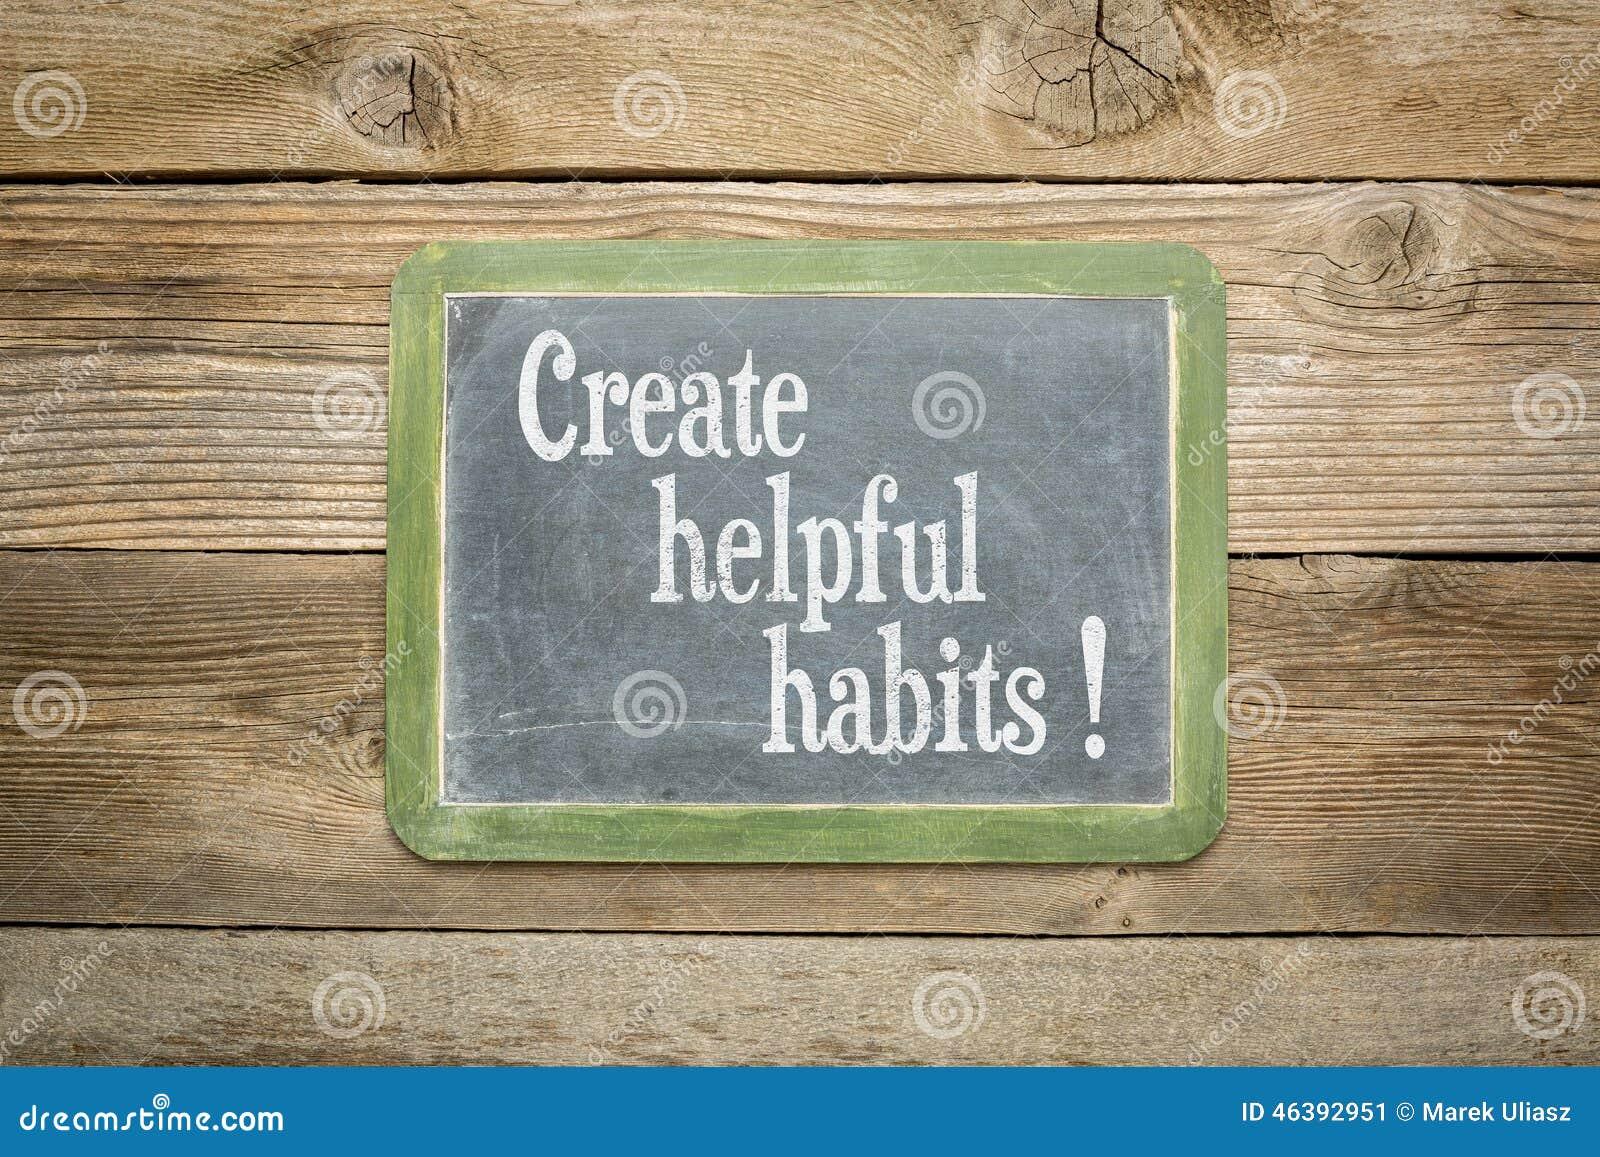 Stocks Download Shivam Creation: Create Helpful Habits Stock Image. Image Of Helpful